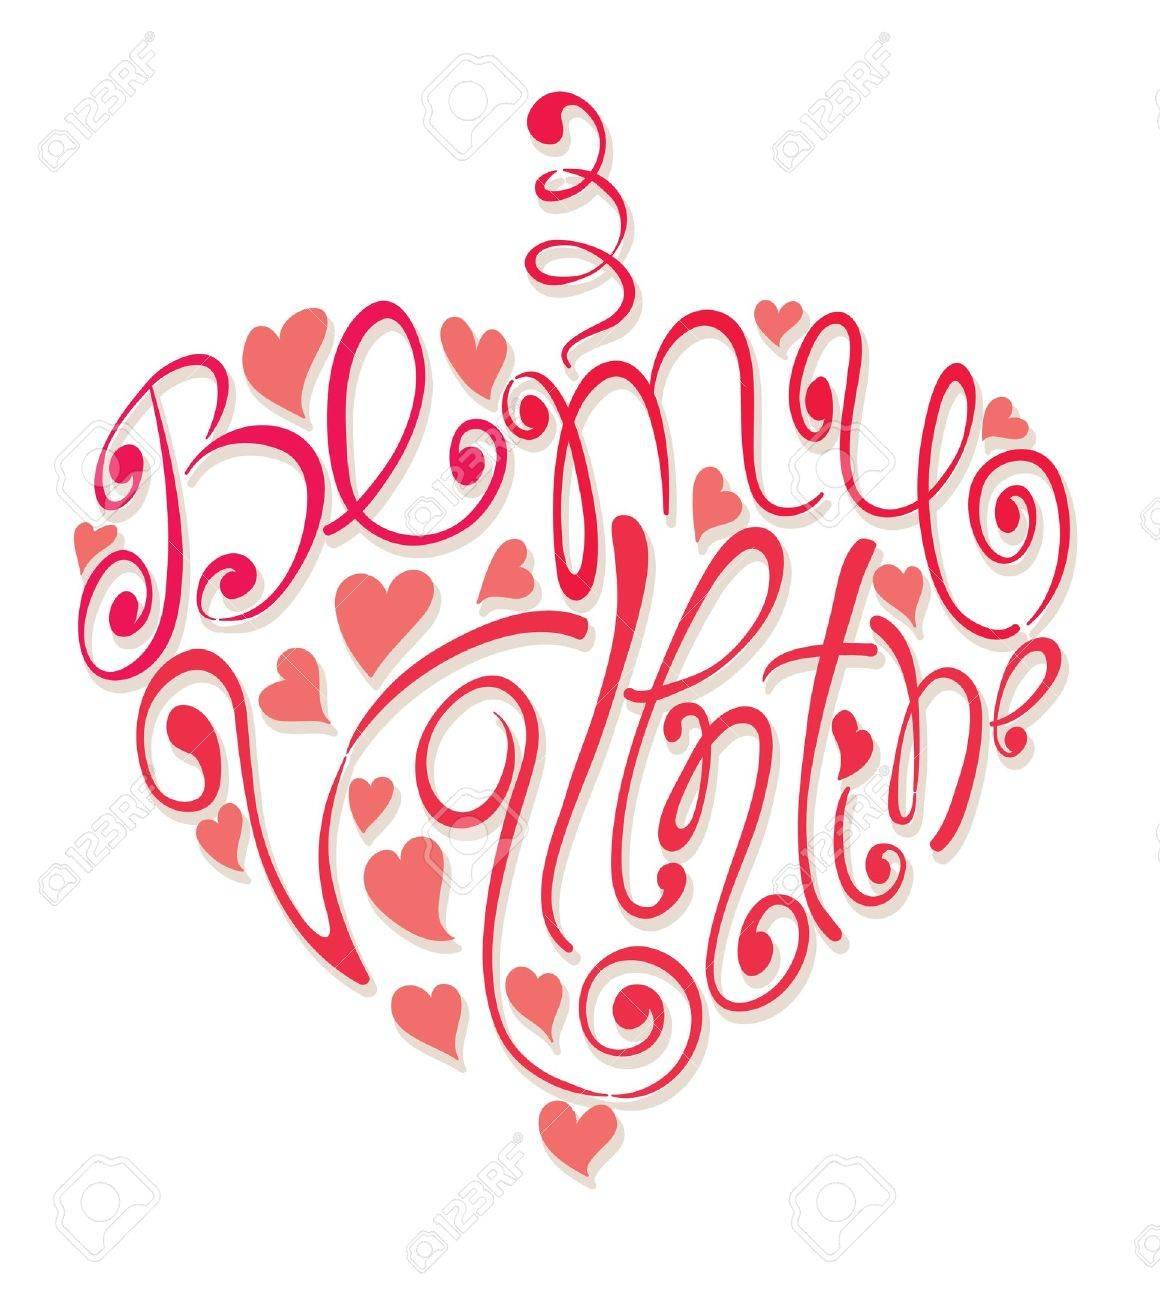 Heart - Be my Valentine Stock Vector - 11463923